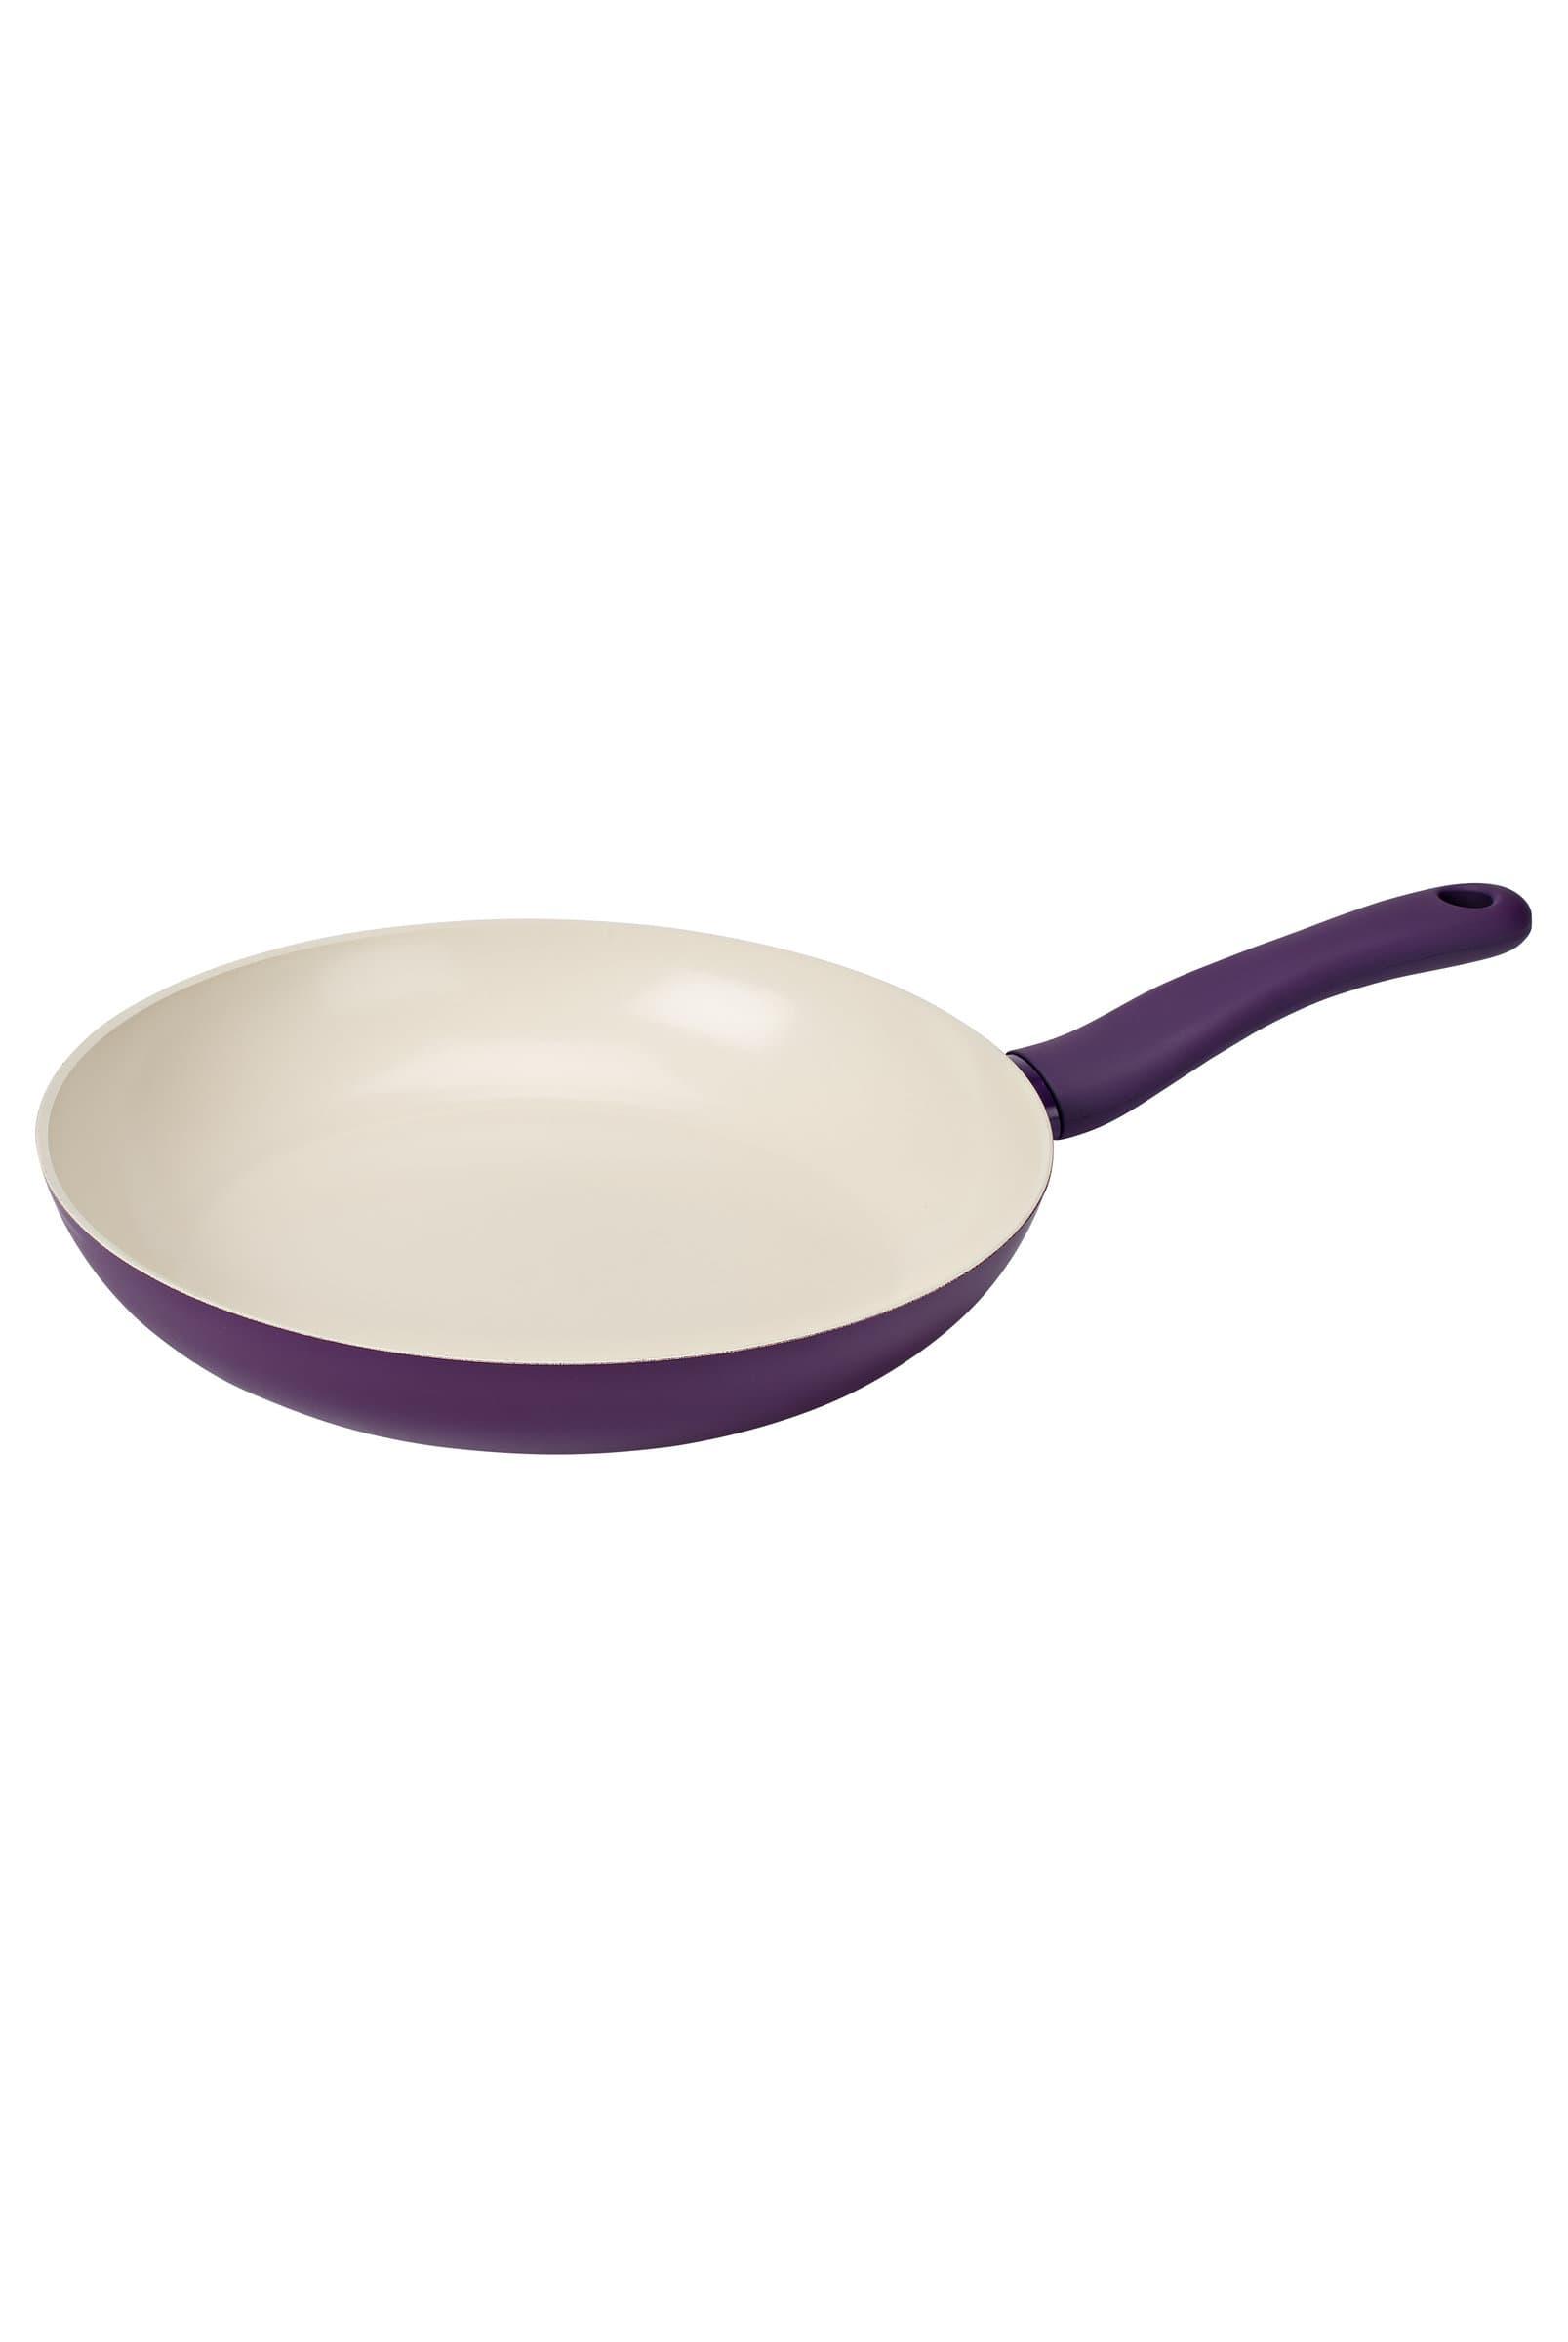 Cucina & Tavola GASTRO Poêle 28cm flat